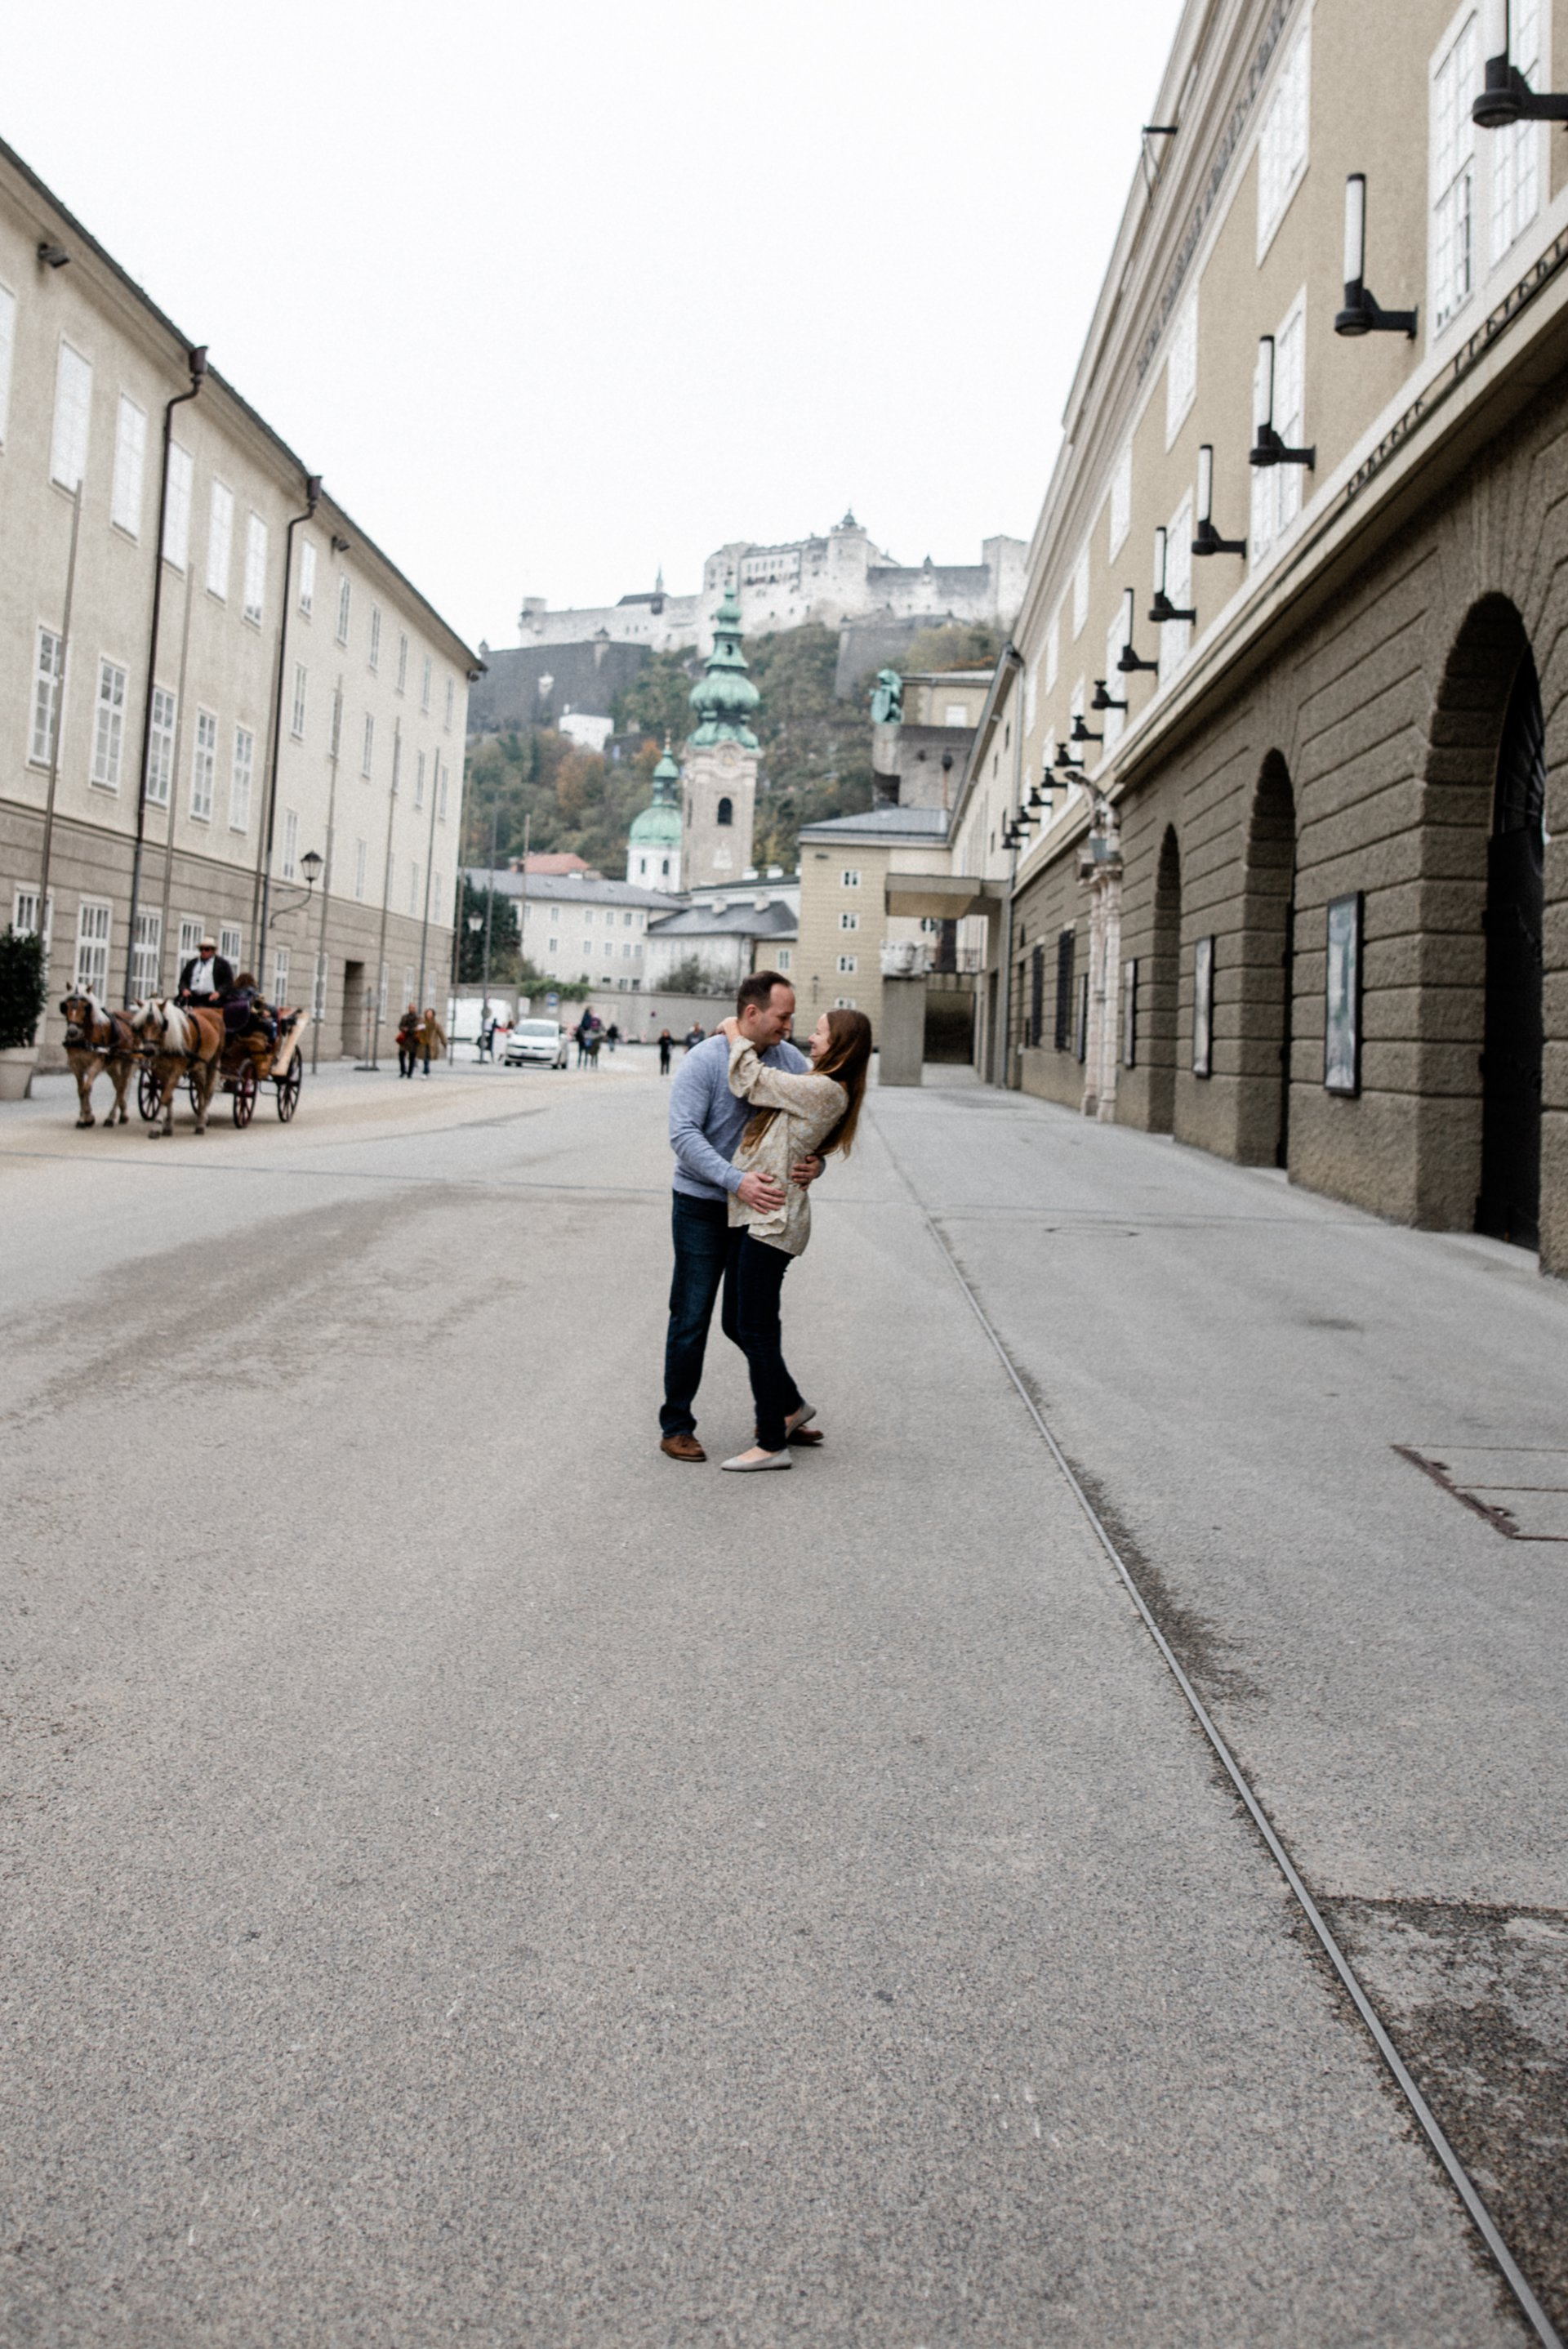 Salzburg-Austria-travel-story-Flytographer-13